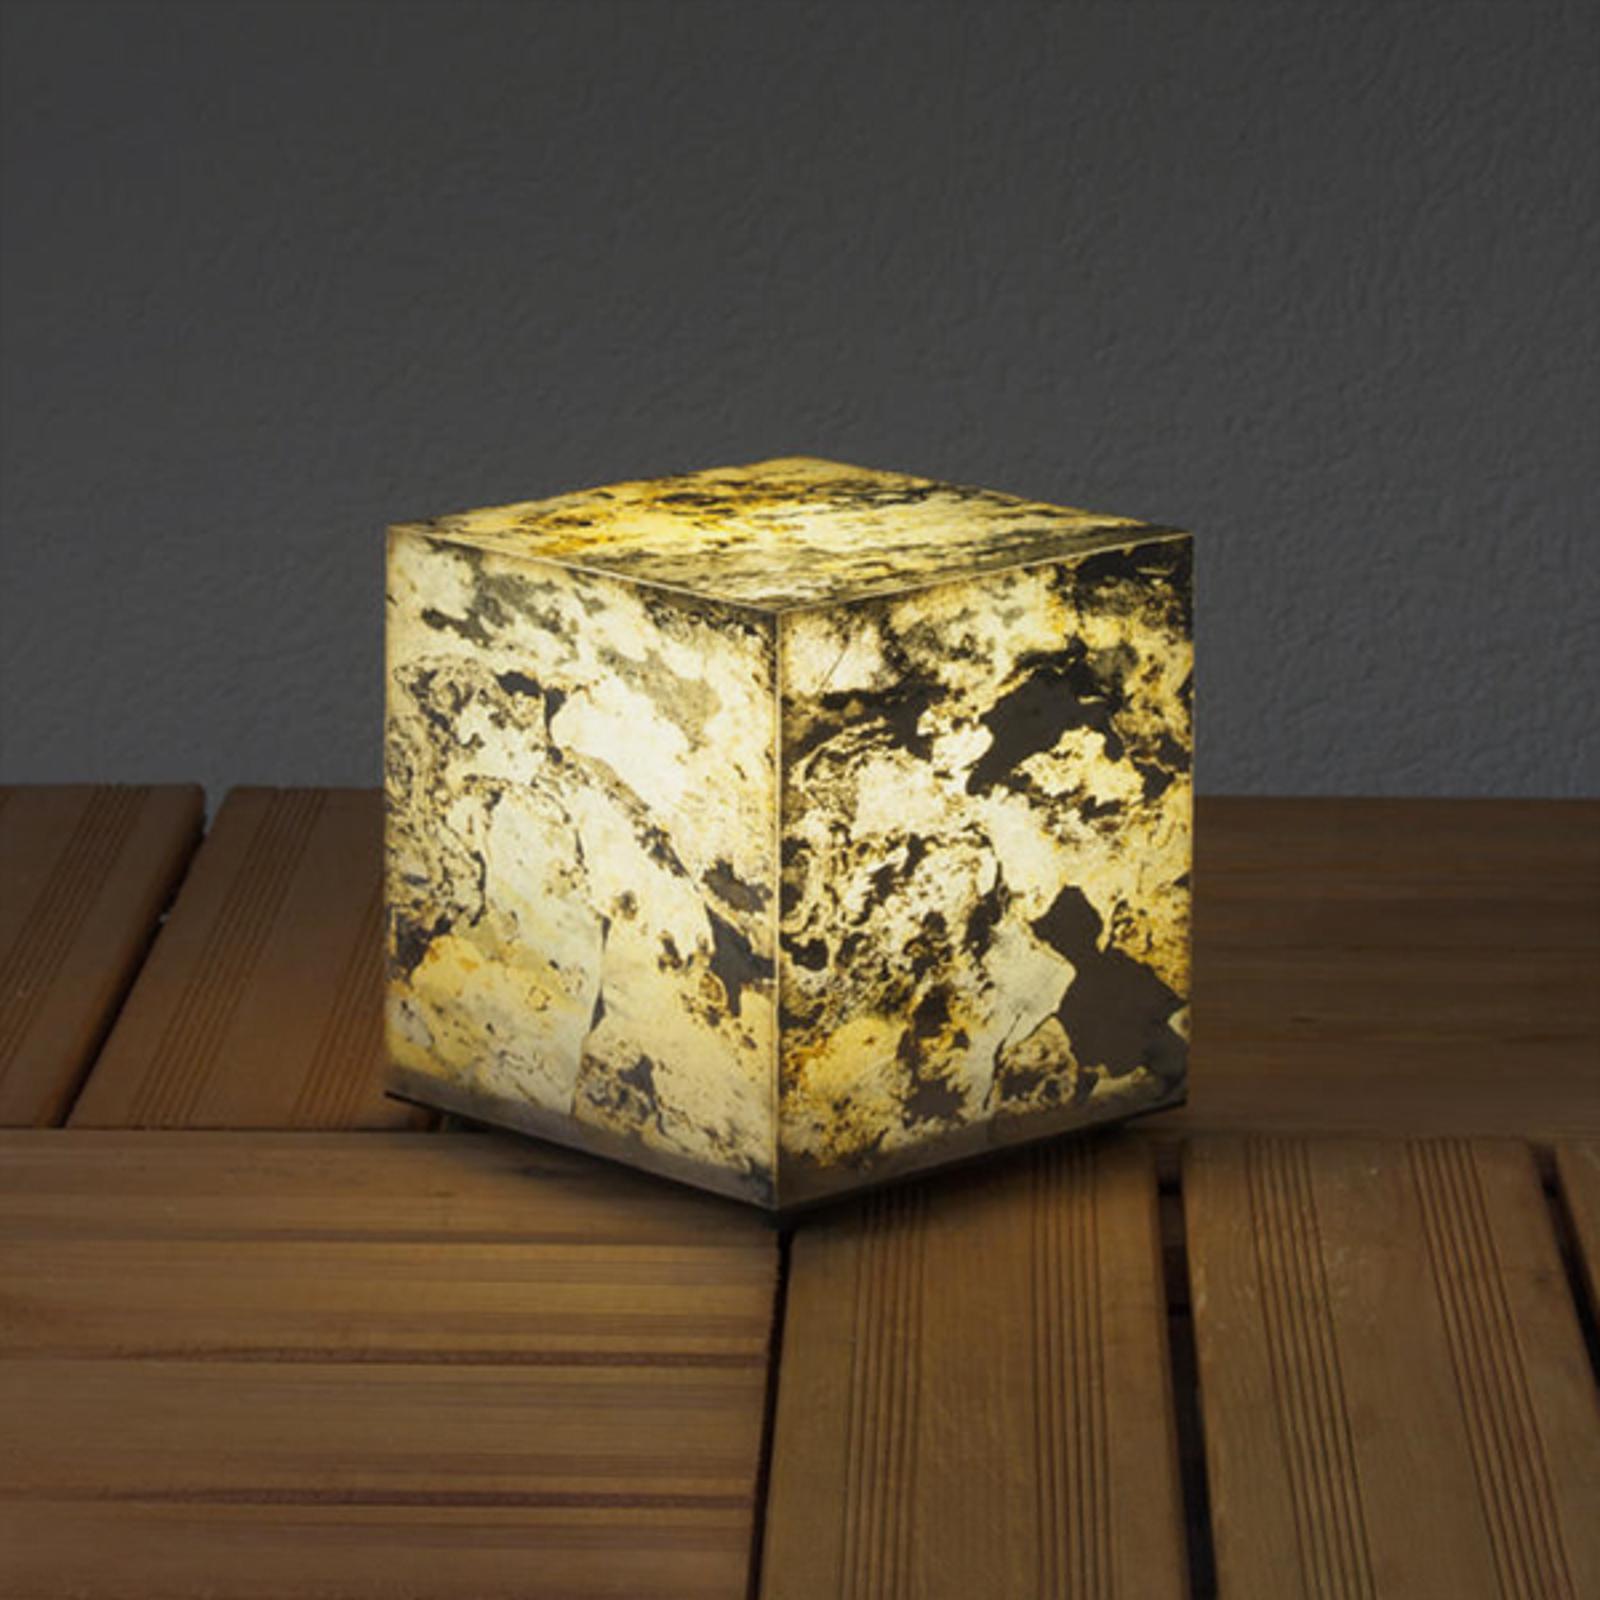 Lampada decorativa cubica di ardesia, 19 cm